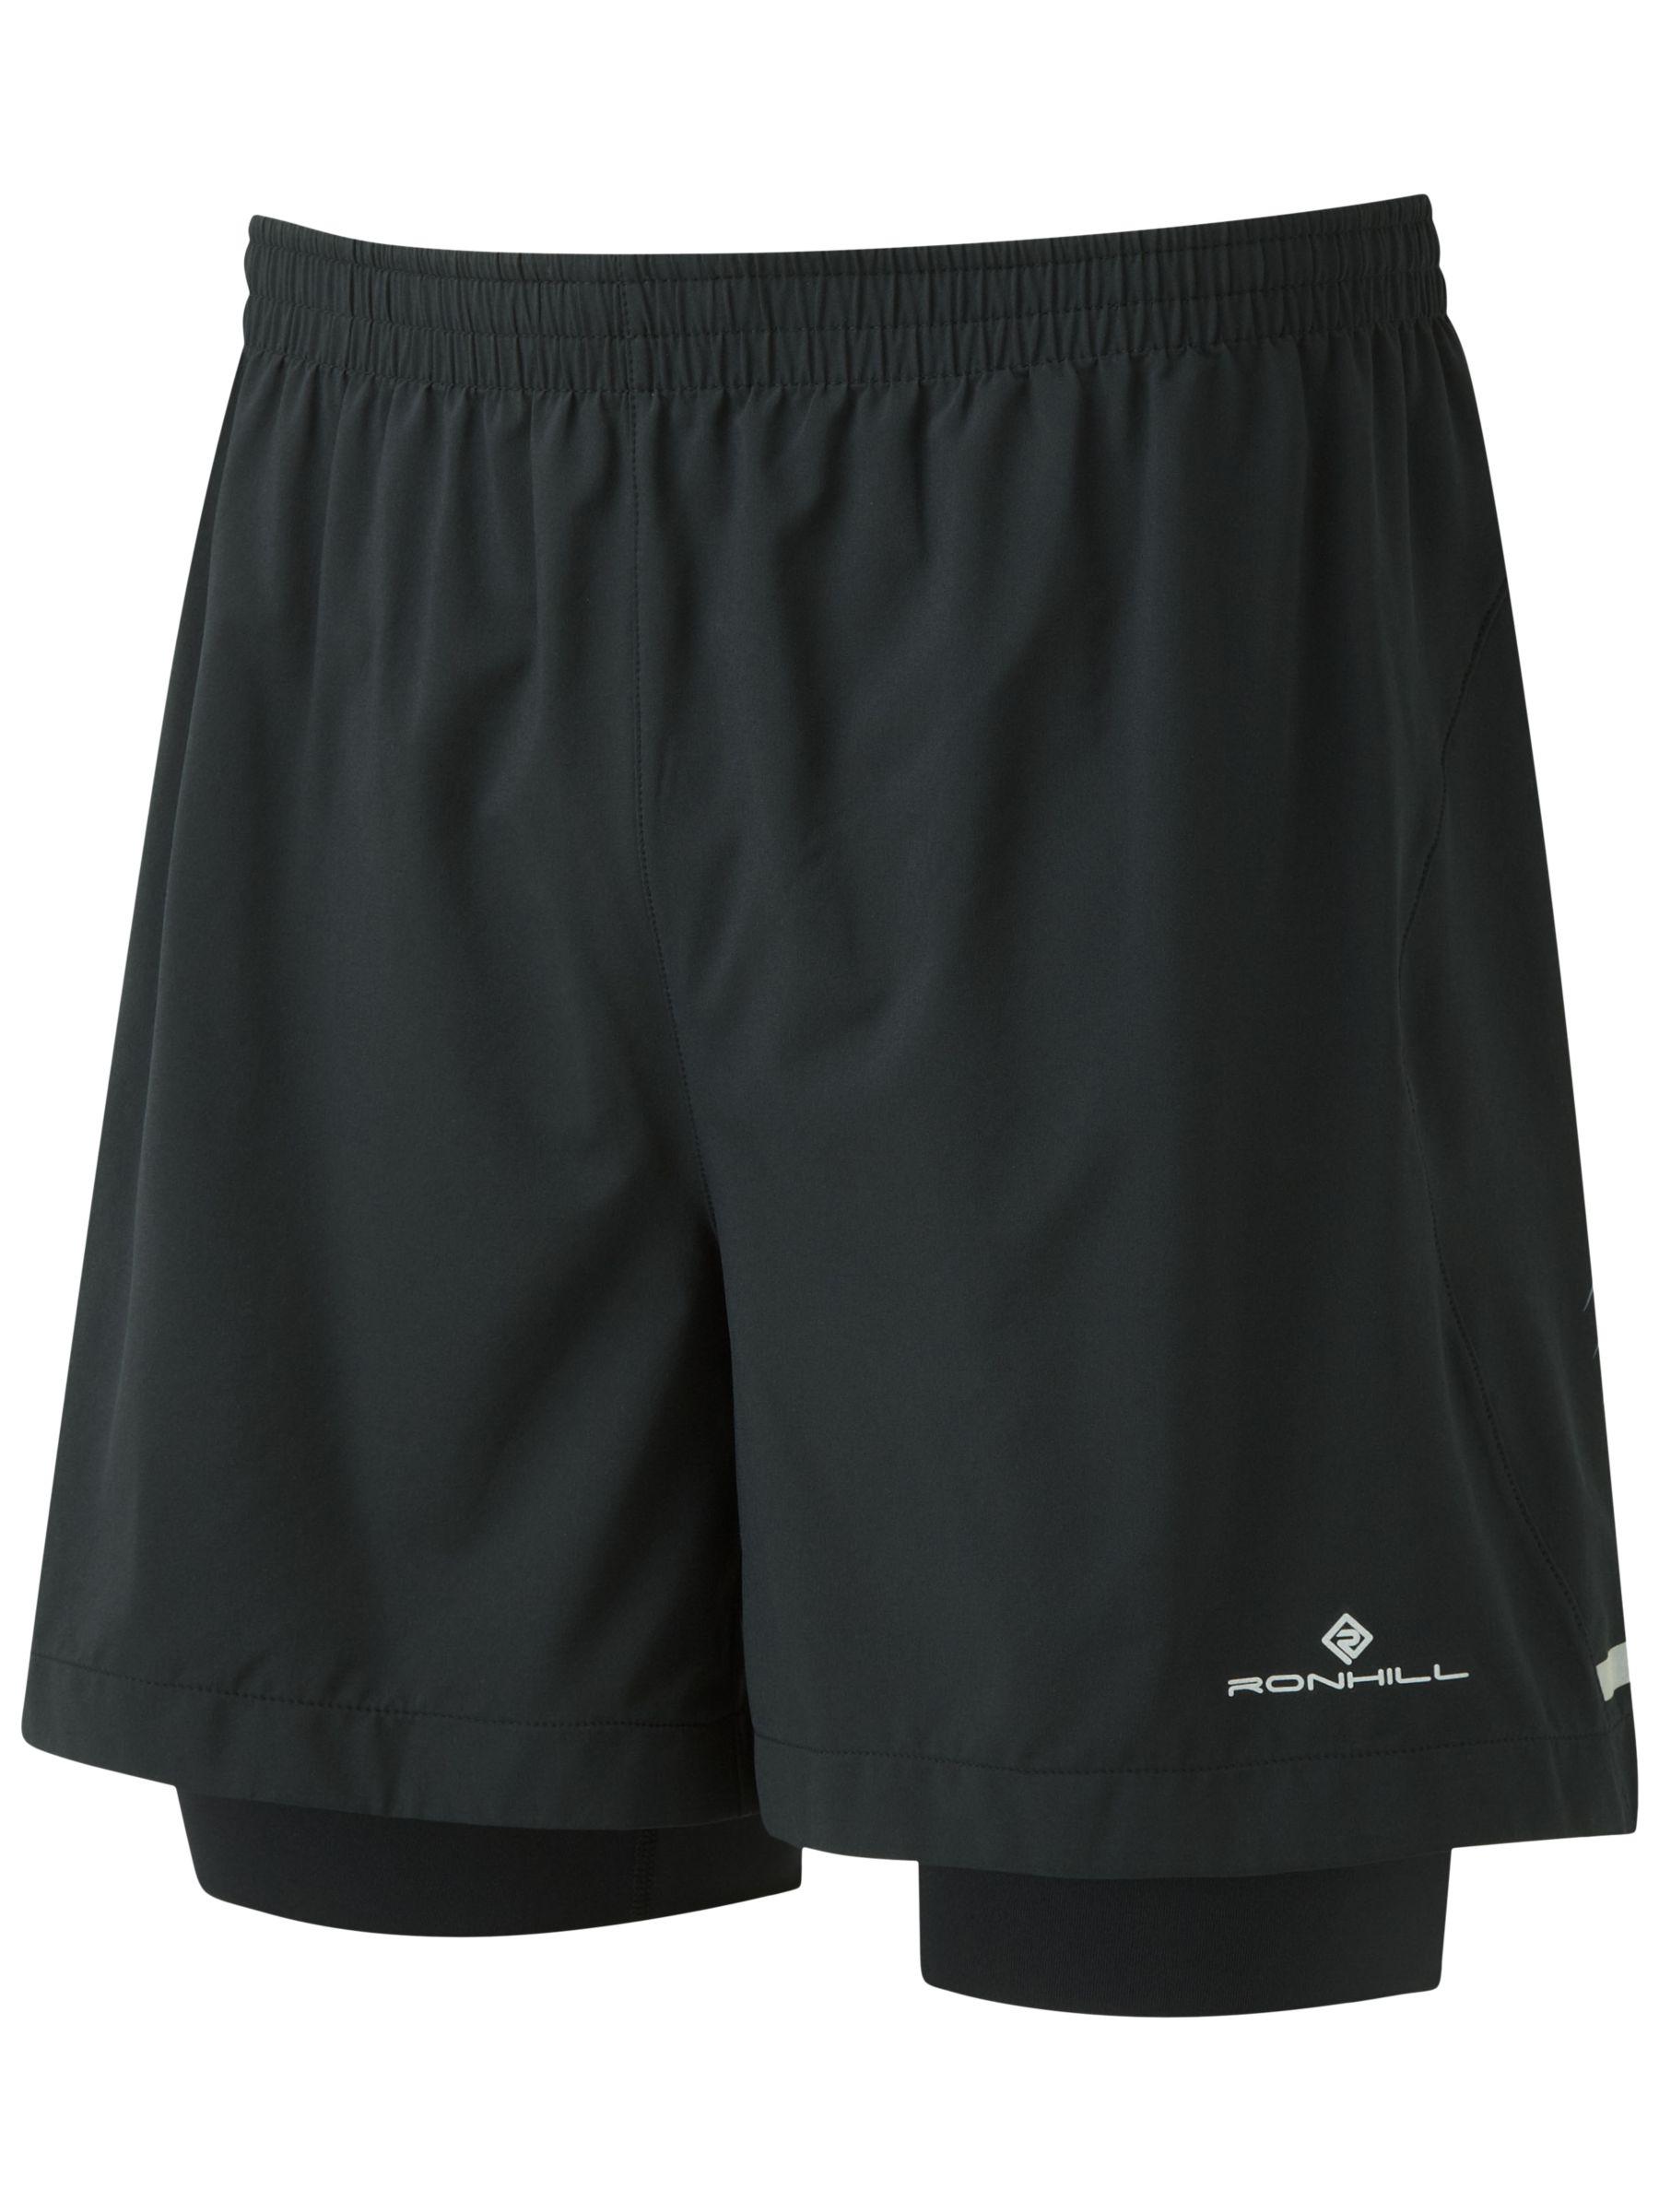 Ronhill Ronhill Stride Twin 5 Running Shorts, Black